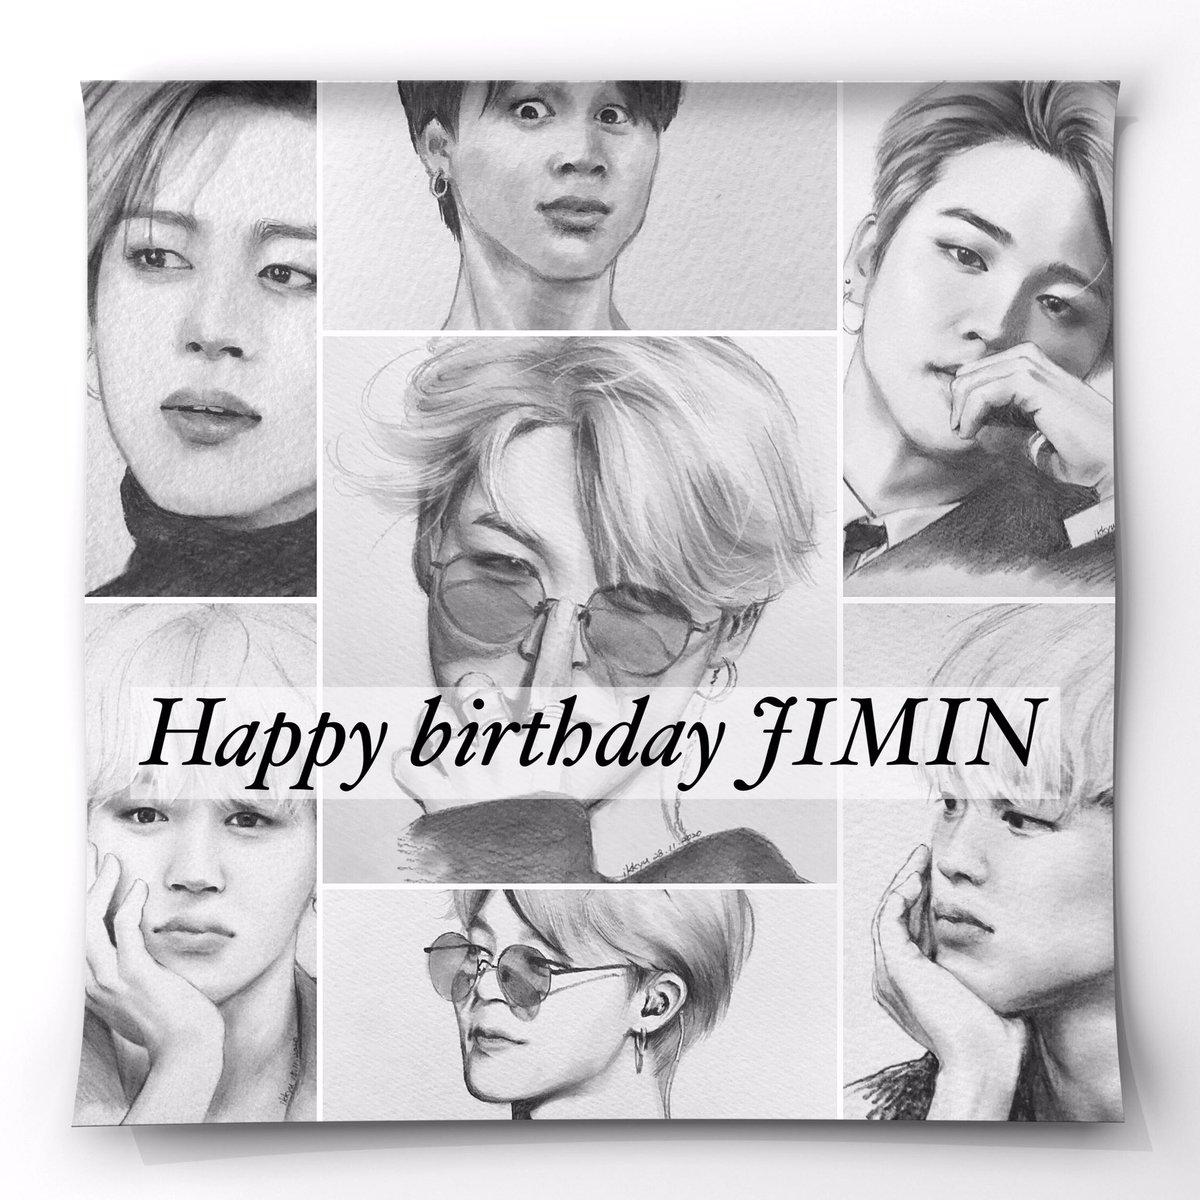 RT @ikkyu72: #HappyJiminDay  #HappyBirthdayJimin  #JIMINDAY   お誕生日おめでとう🎂 https://t.co/QKJ5tFqFJ1